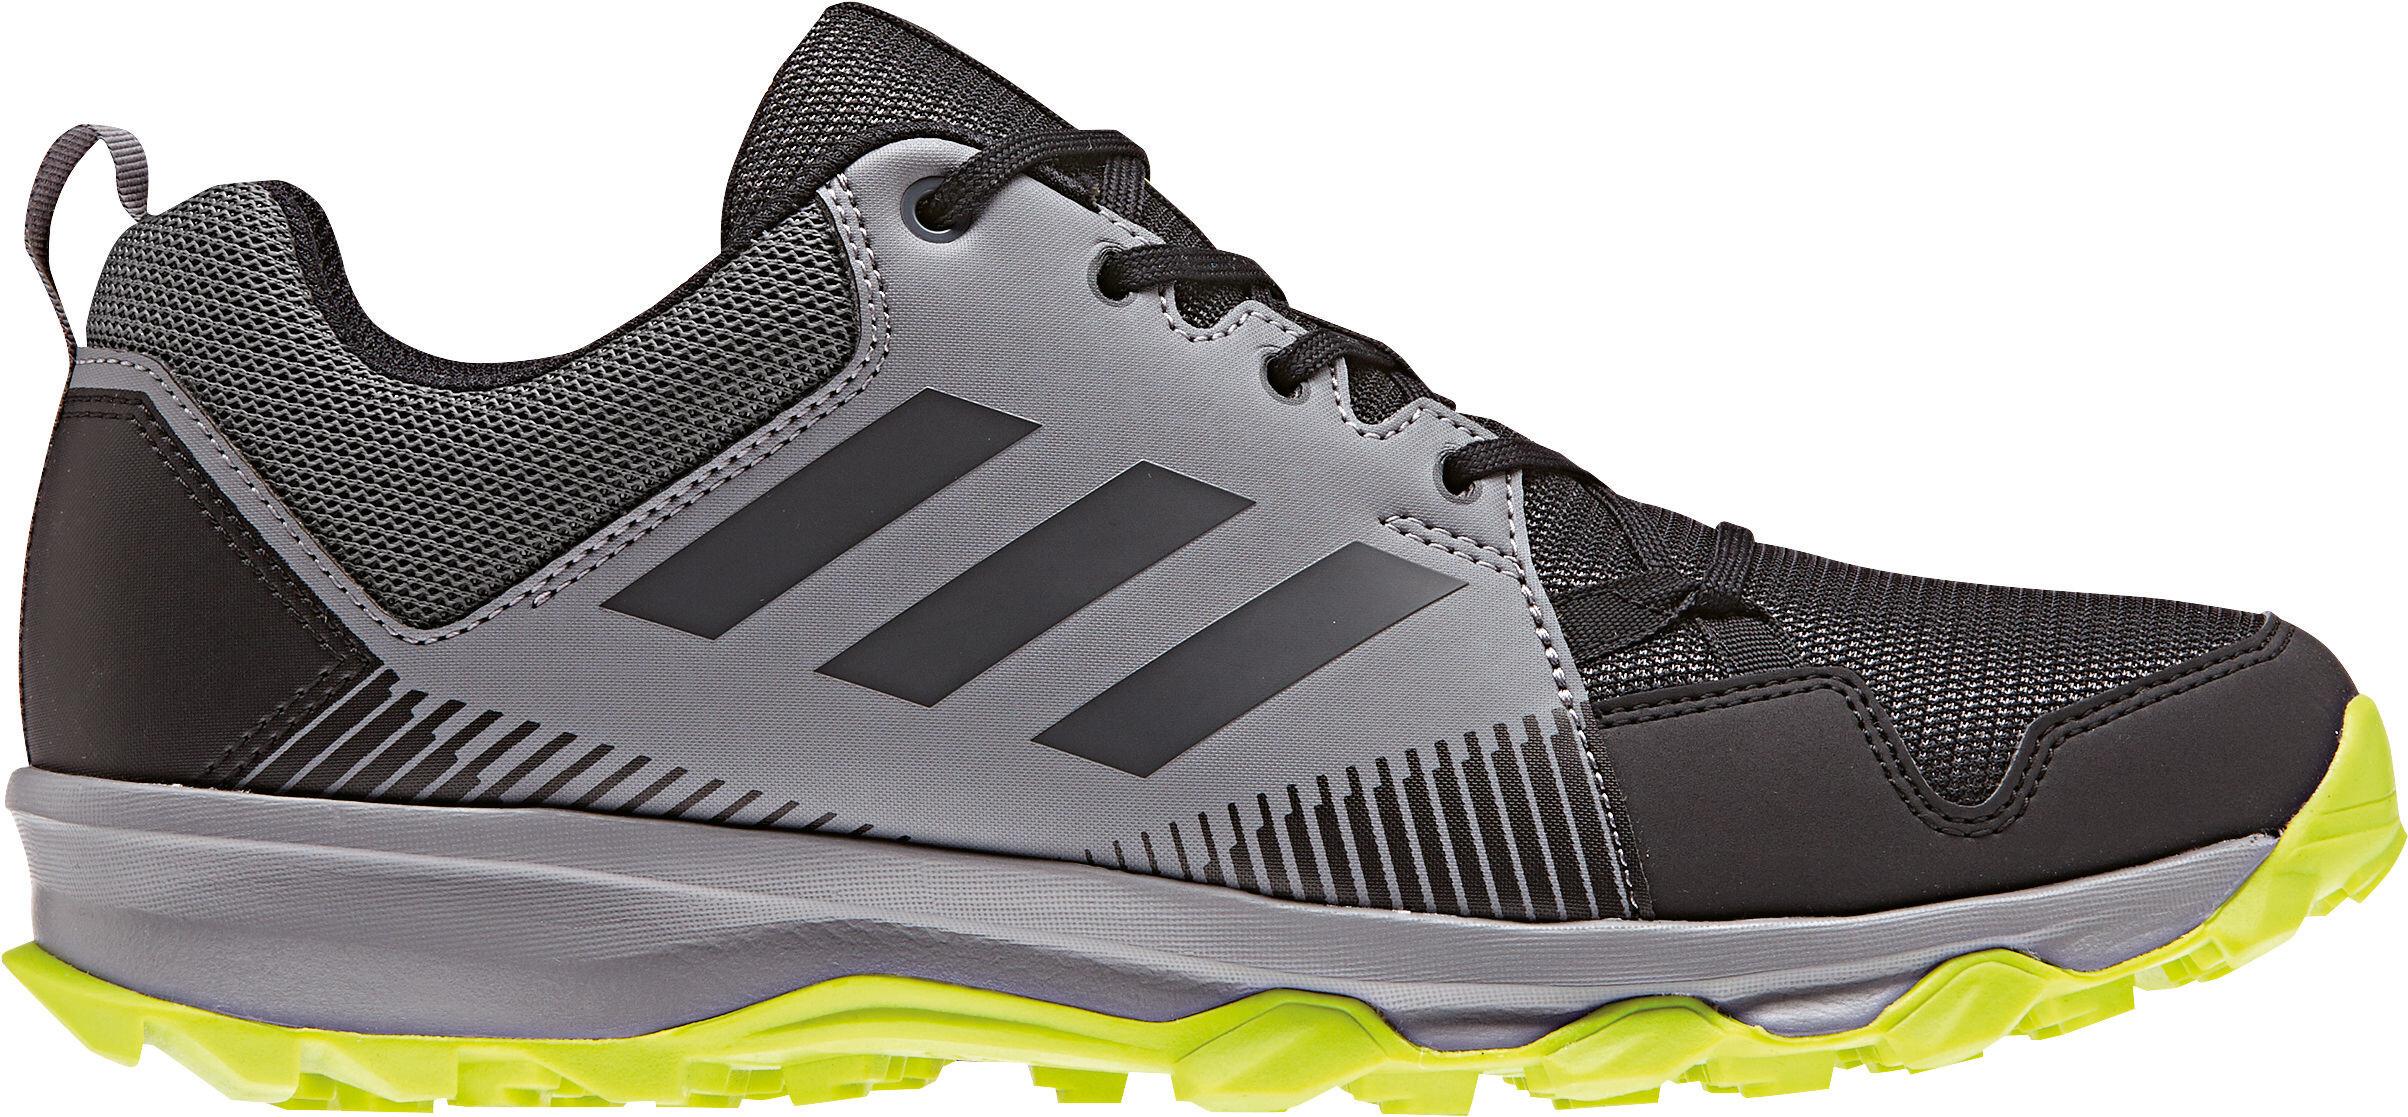 e0f6858edb11 adidas TERREX Tracerocker Running Shoes Men grey at Addnature.co.uk